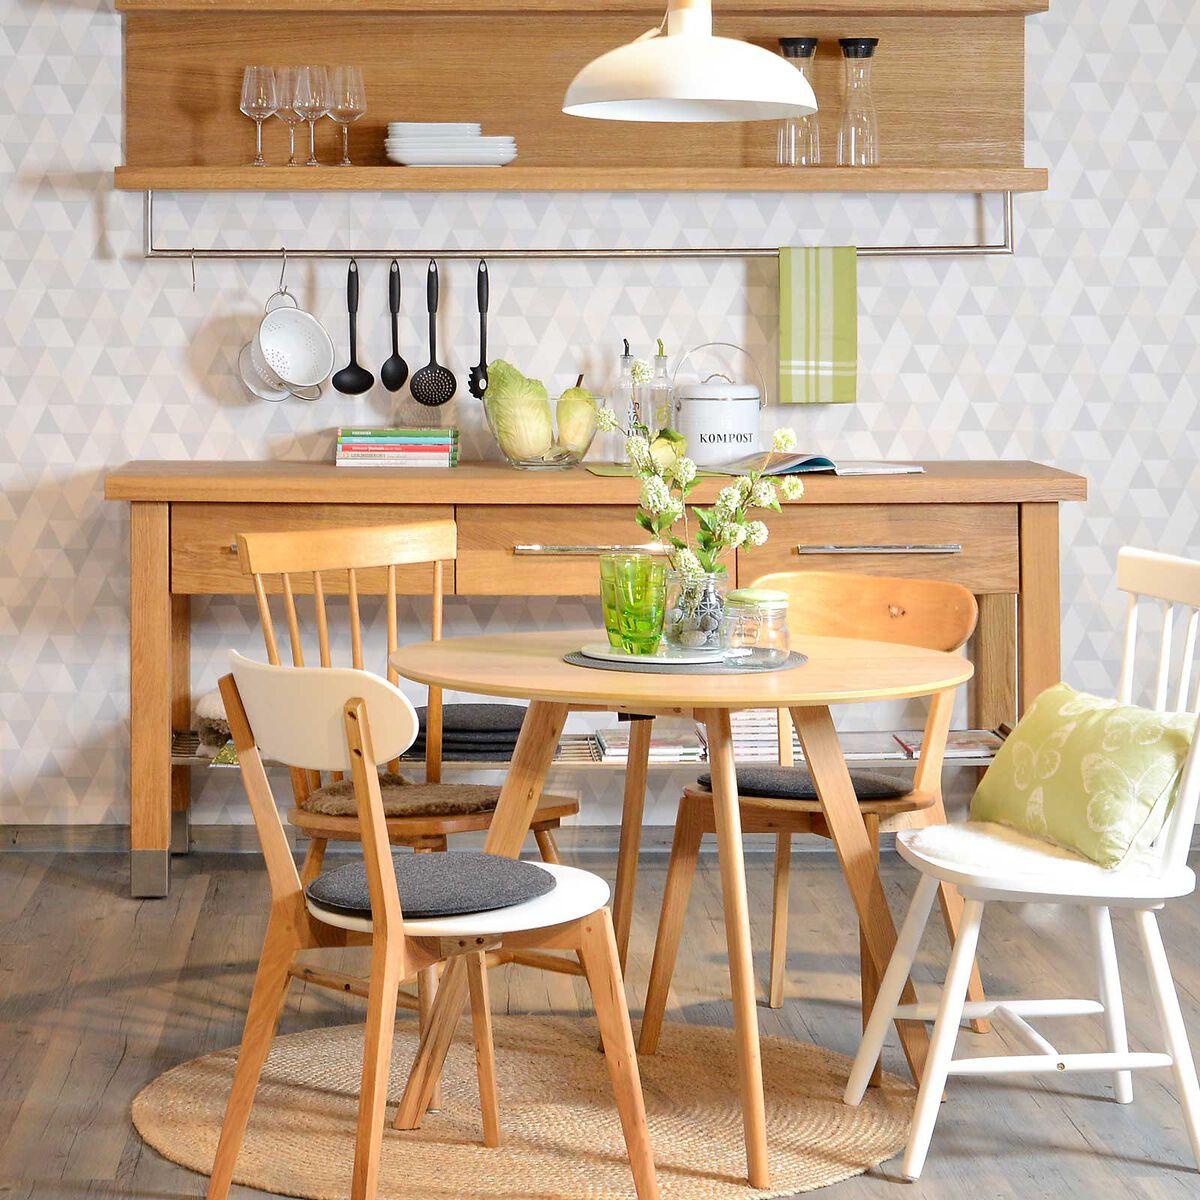 stuhl eiche ca b 54 x h 79 x t 44 5cm wei depot de. Black Bedroom Furniture Sets. Home Design Ideas